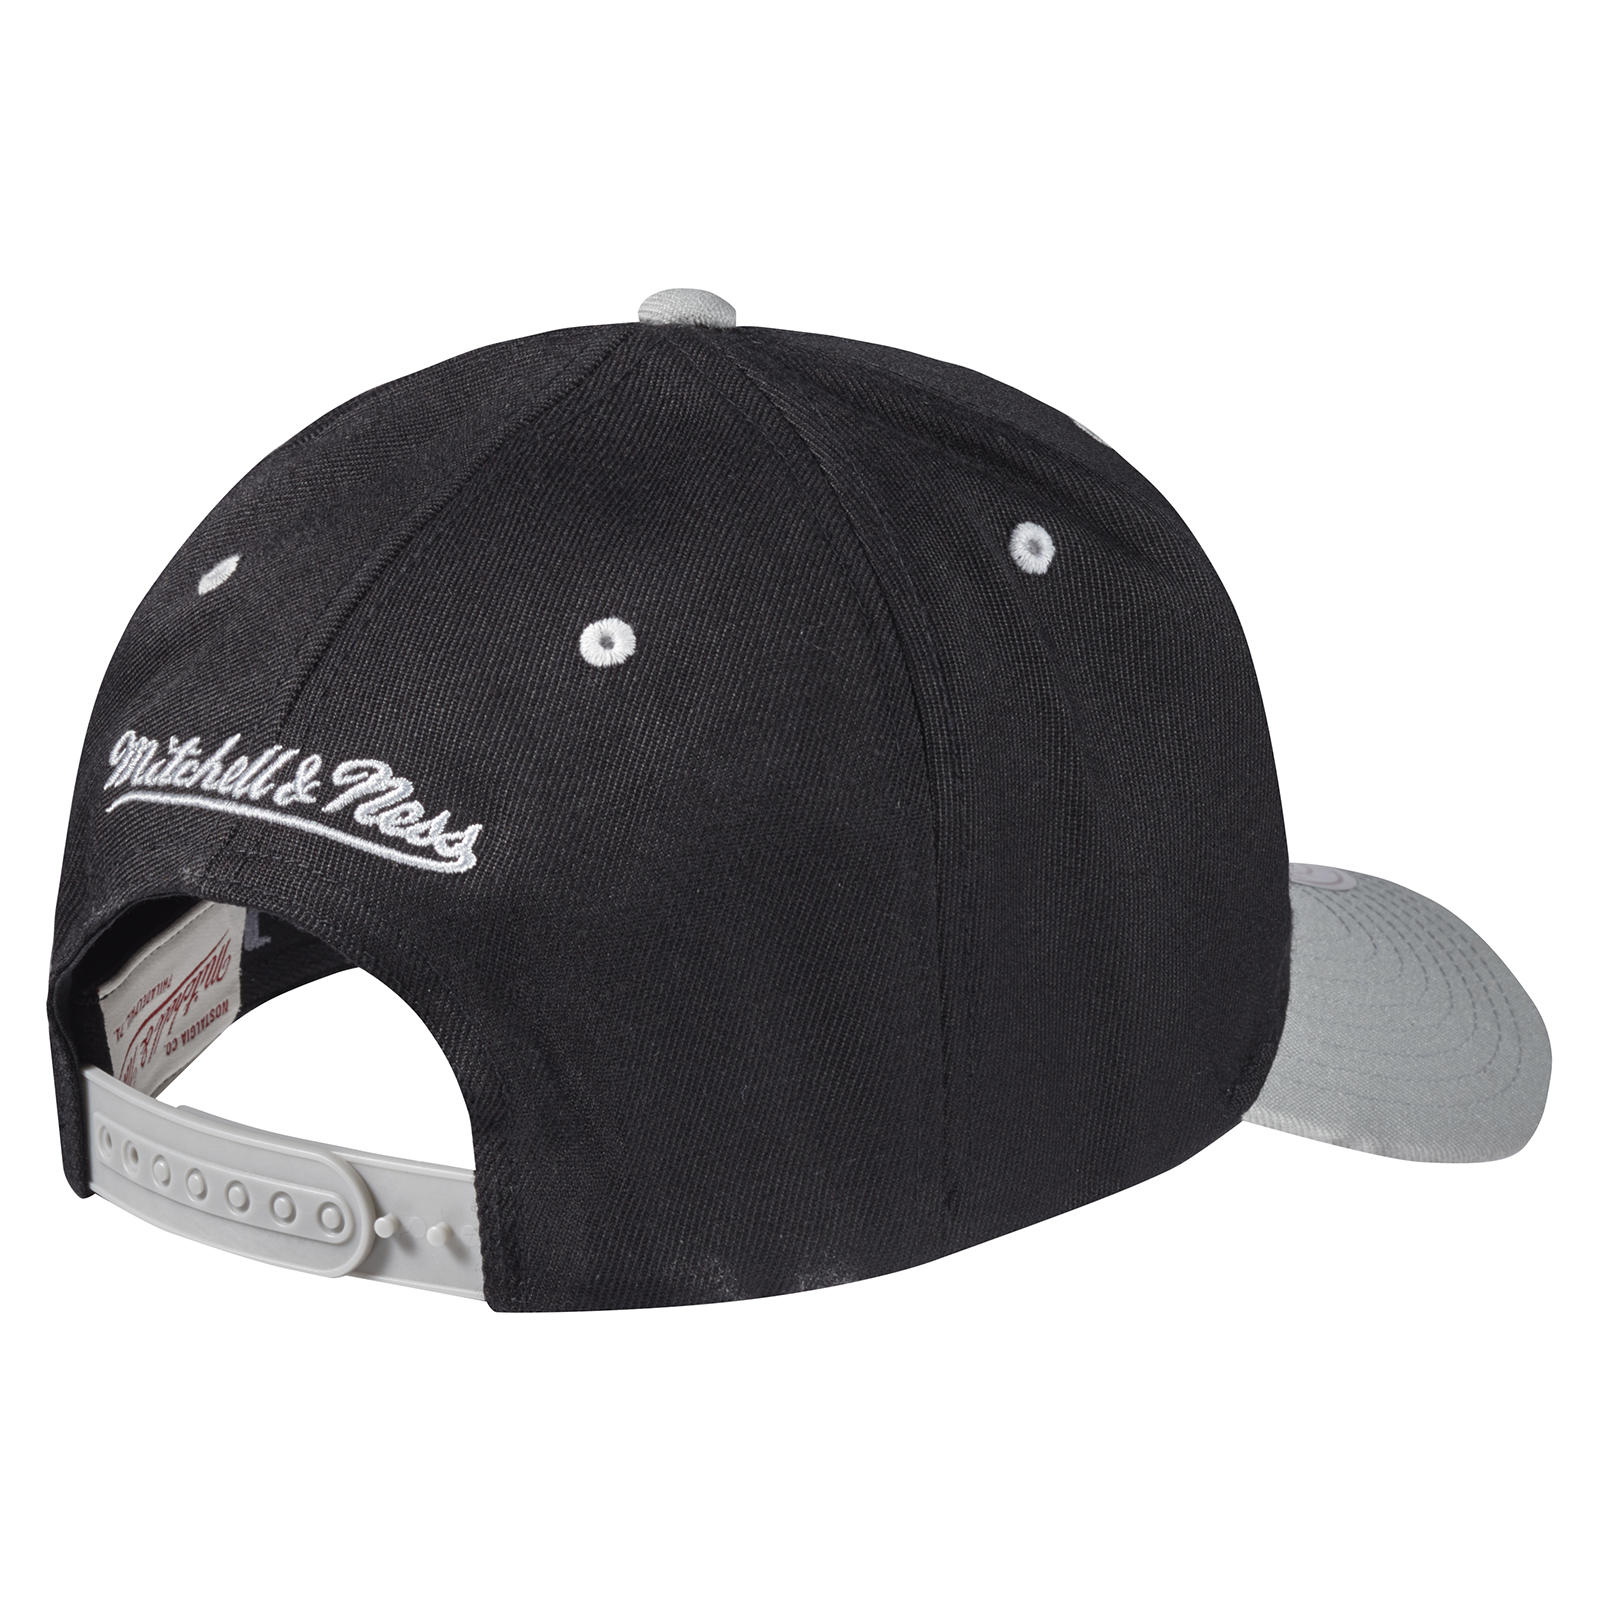 quality design 8bdfe f5aa0 Mitchell   Ness Nostalgia Co.   Team Logo 2-Tone 110 Snapback ...